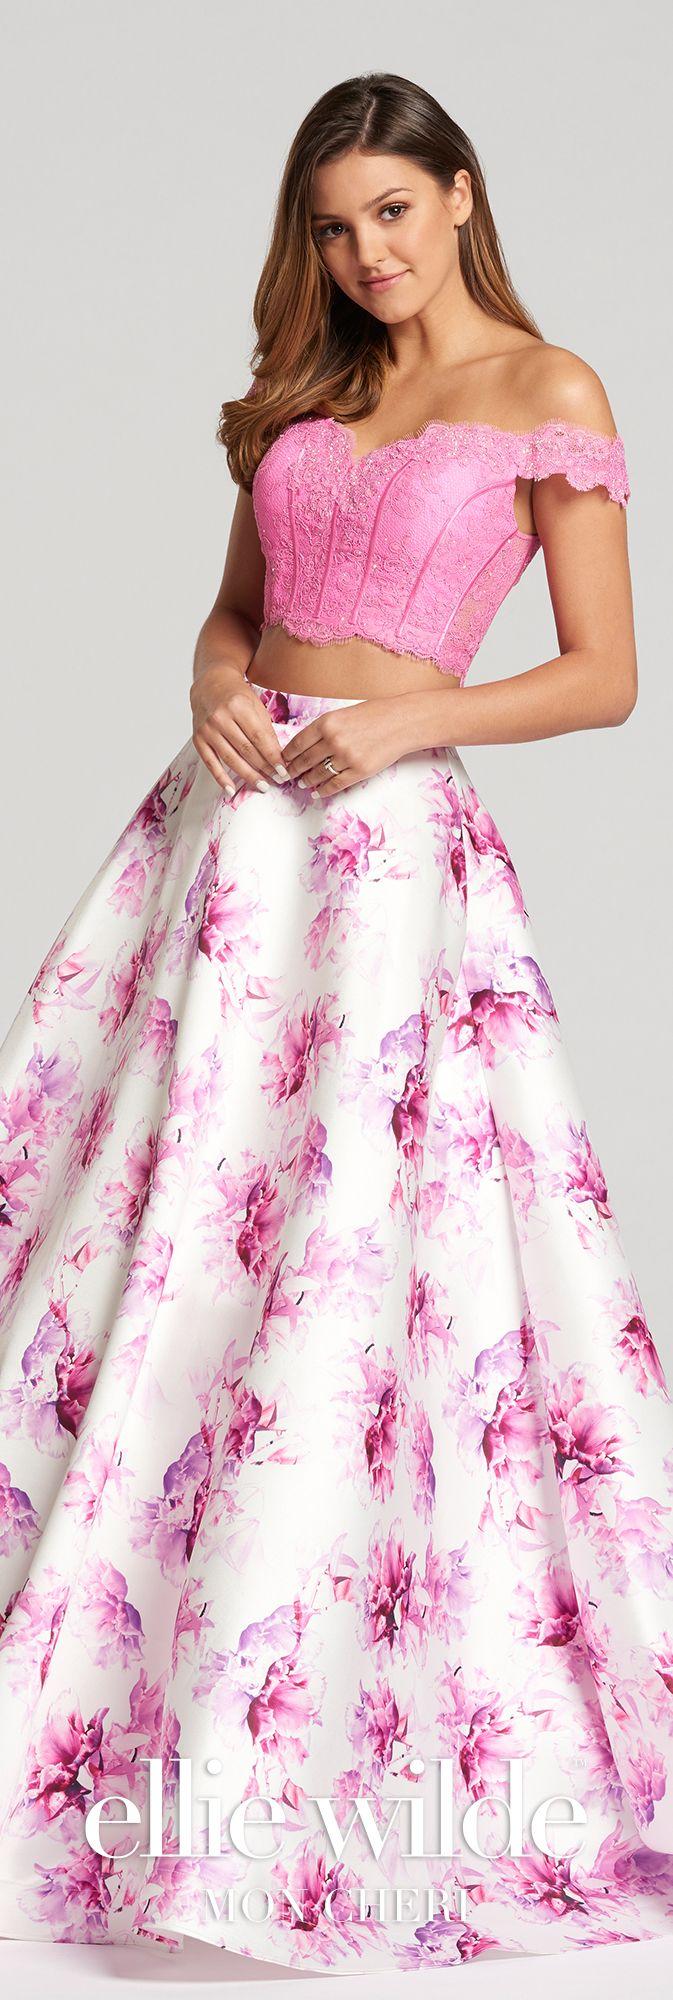 Mejores 251 imágenes de Blush Prom en Pinterest | Rubores, Vestidos ...